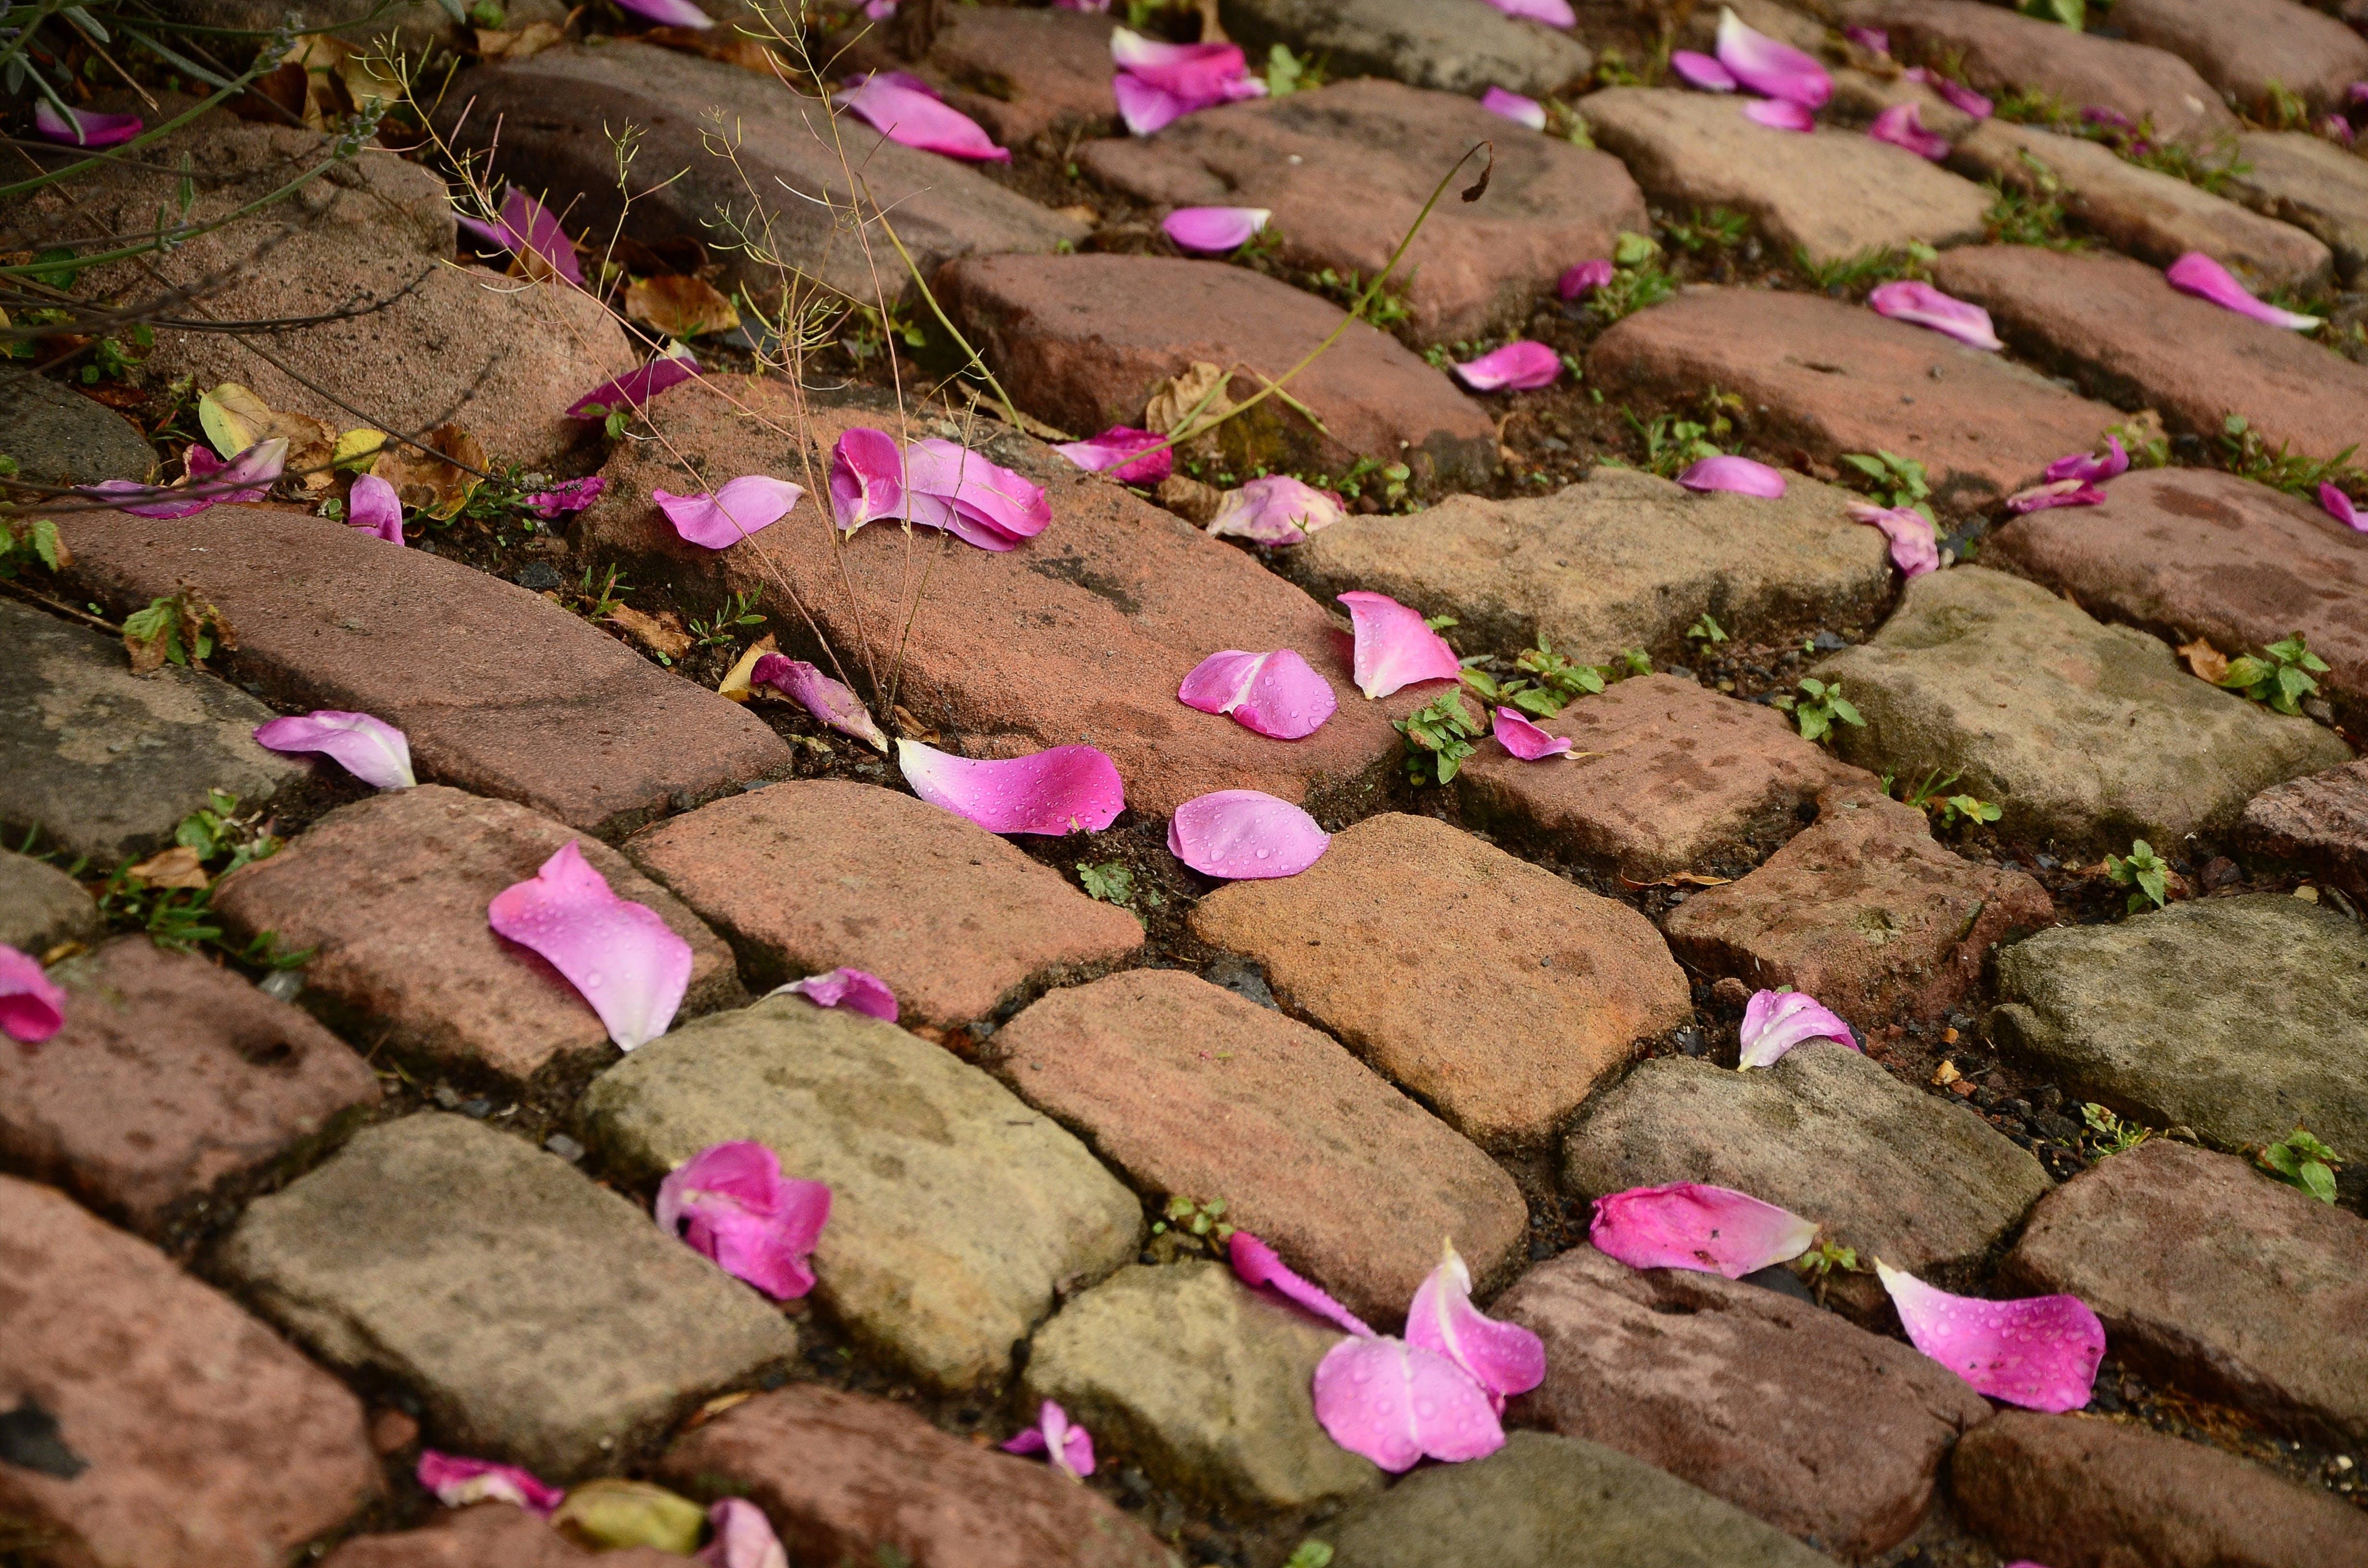 Pink Flower Petals on Brown Brick Way